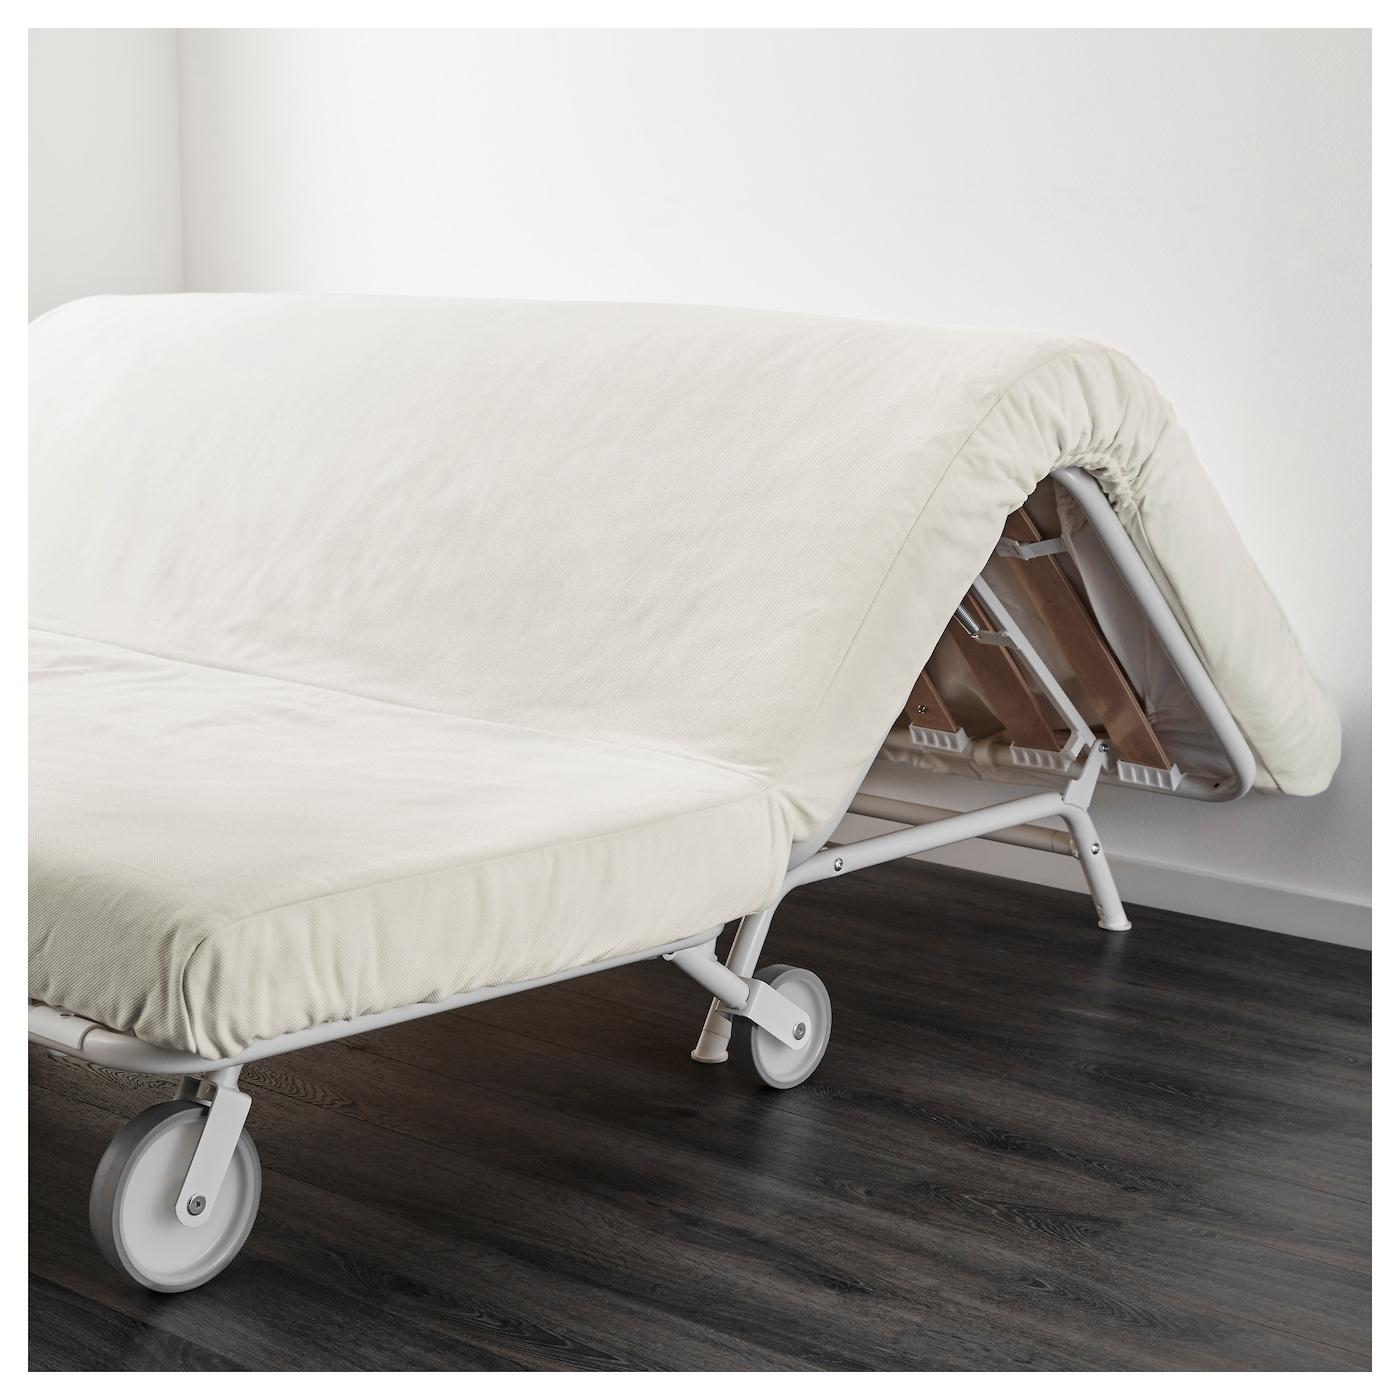 ikea ps h vet two seat sofa bed gr sbo white ikea. Black Bedroom Furniture Sets. Home Design Ideas